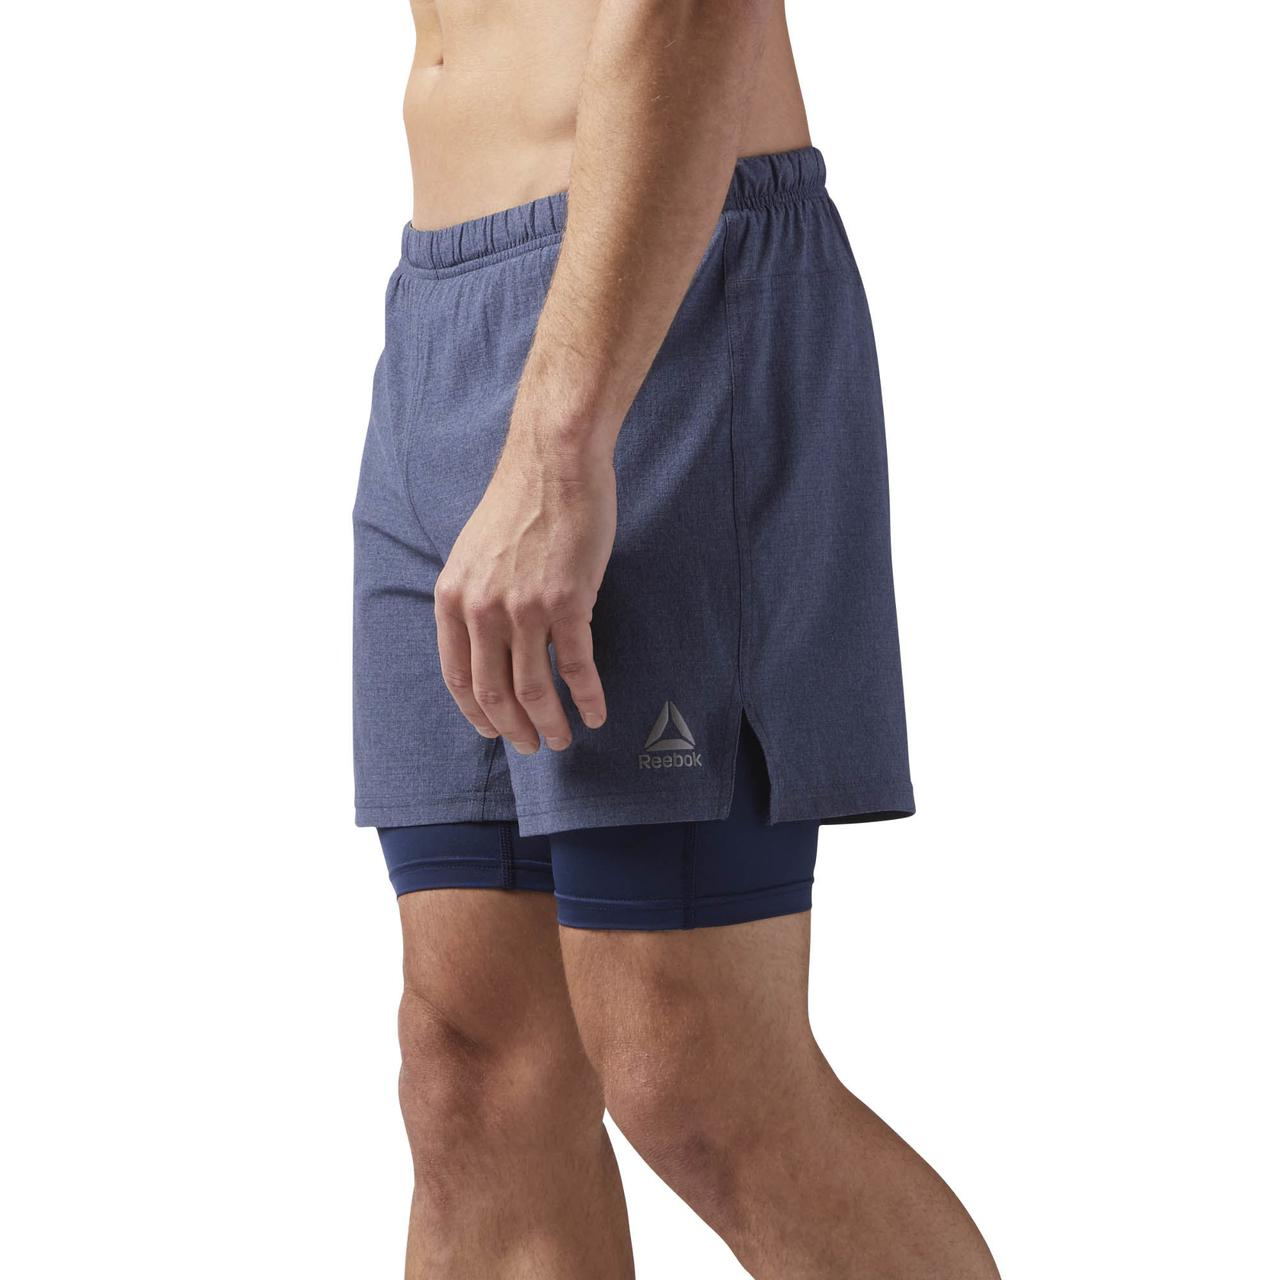 7055cf269149c Купить Мужские шорты Reebok Running 2 In 1 (Артикул: CD5436) в ...